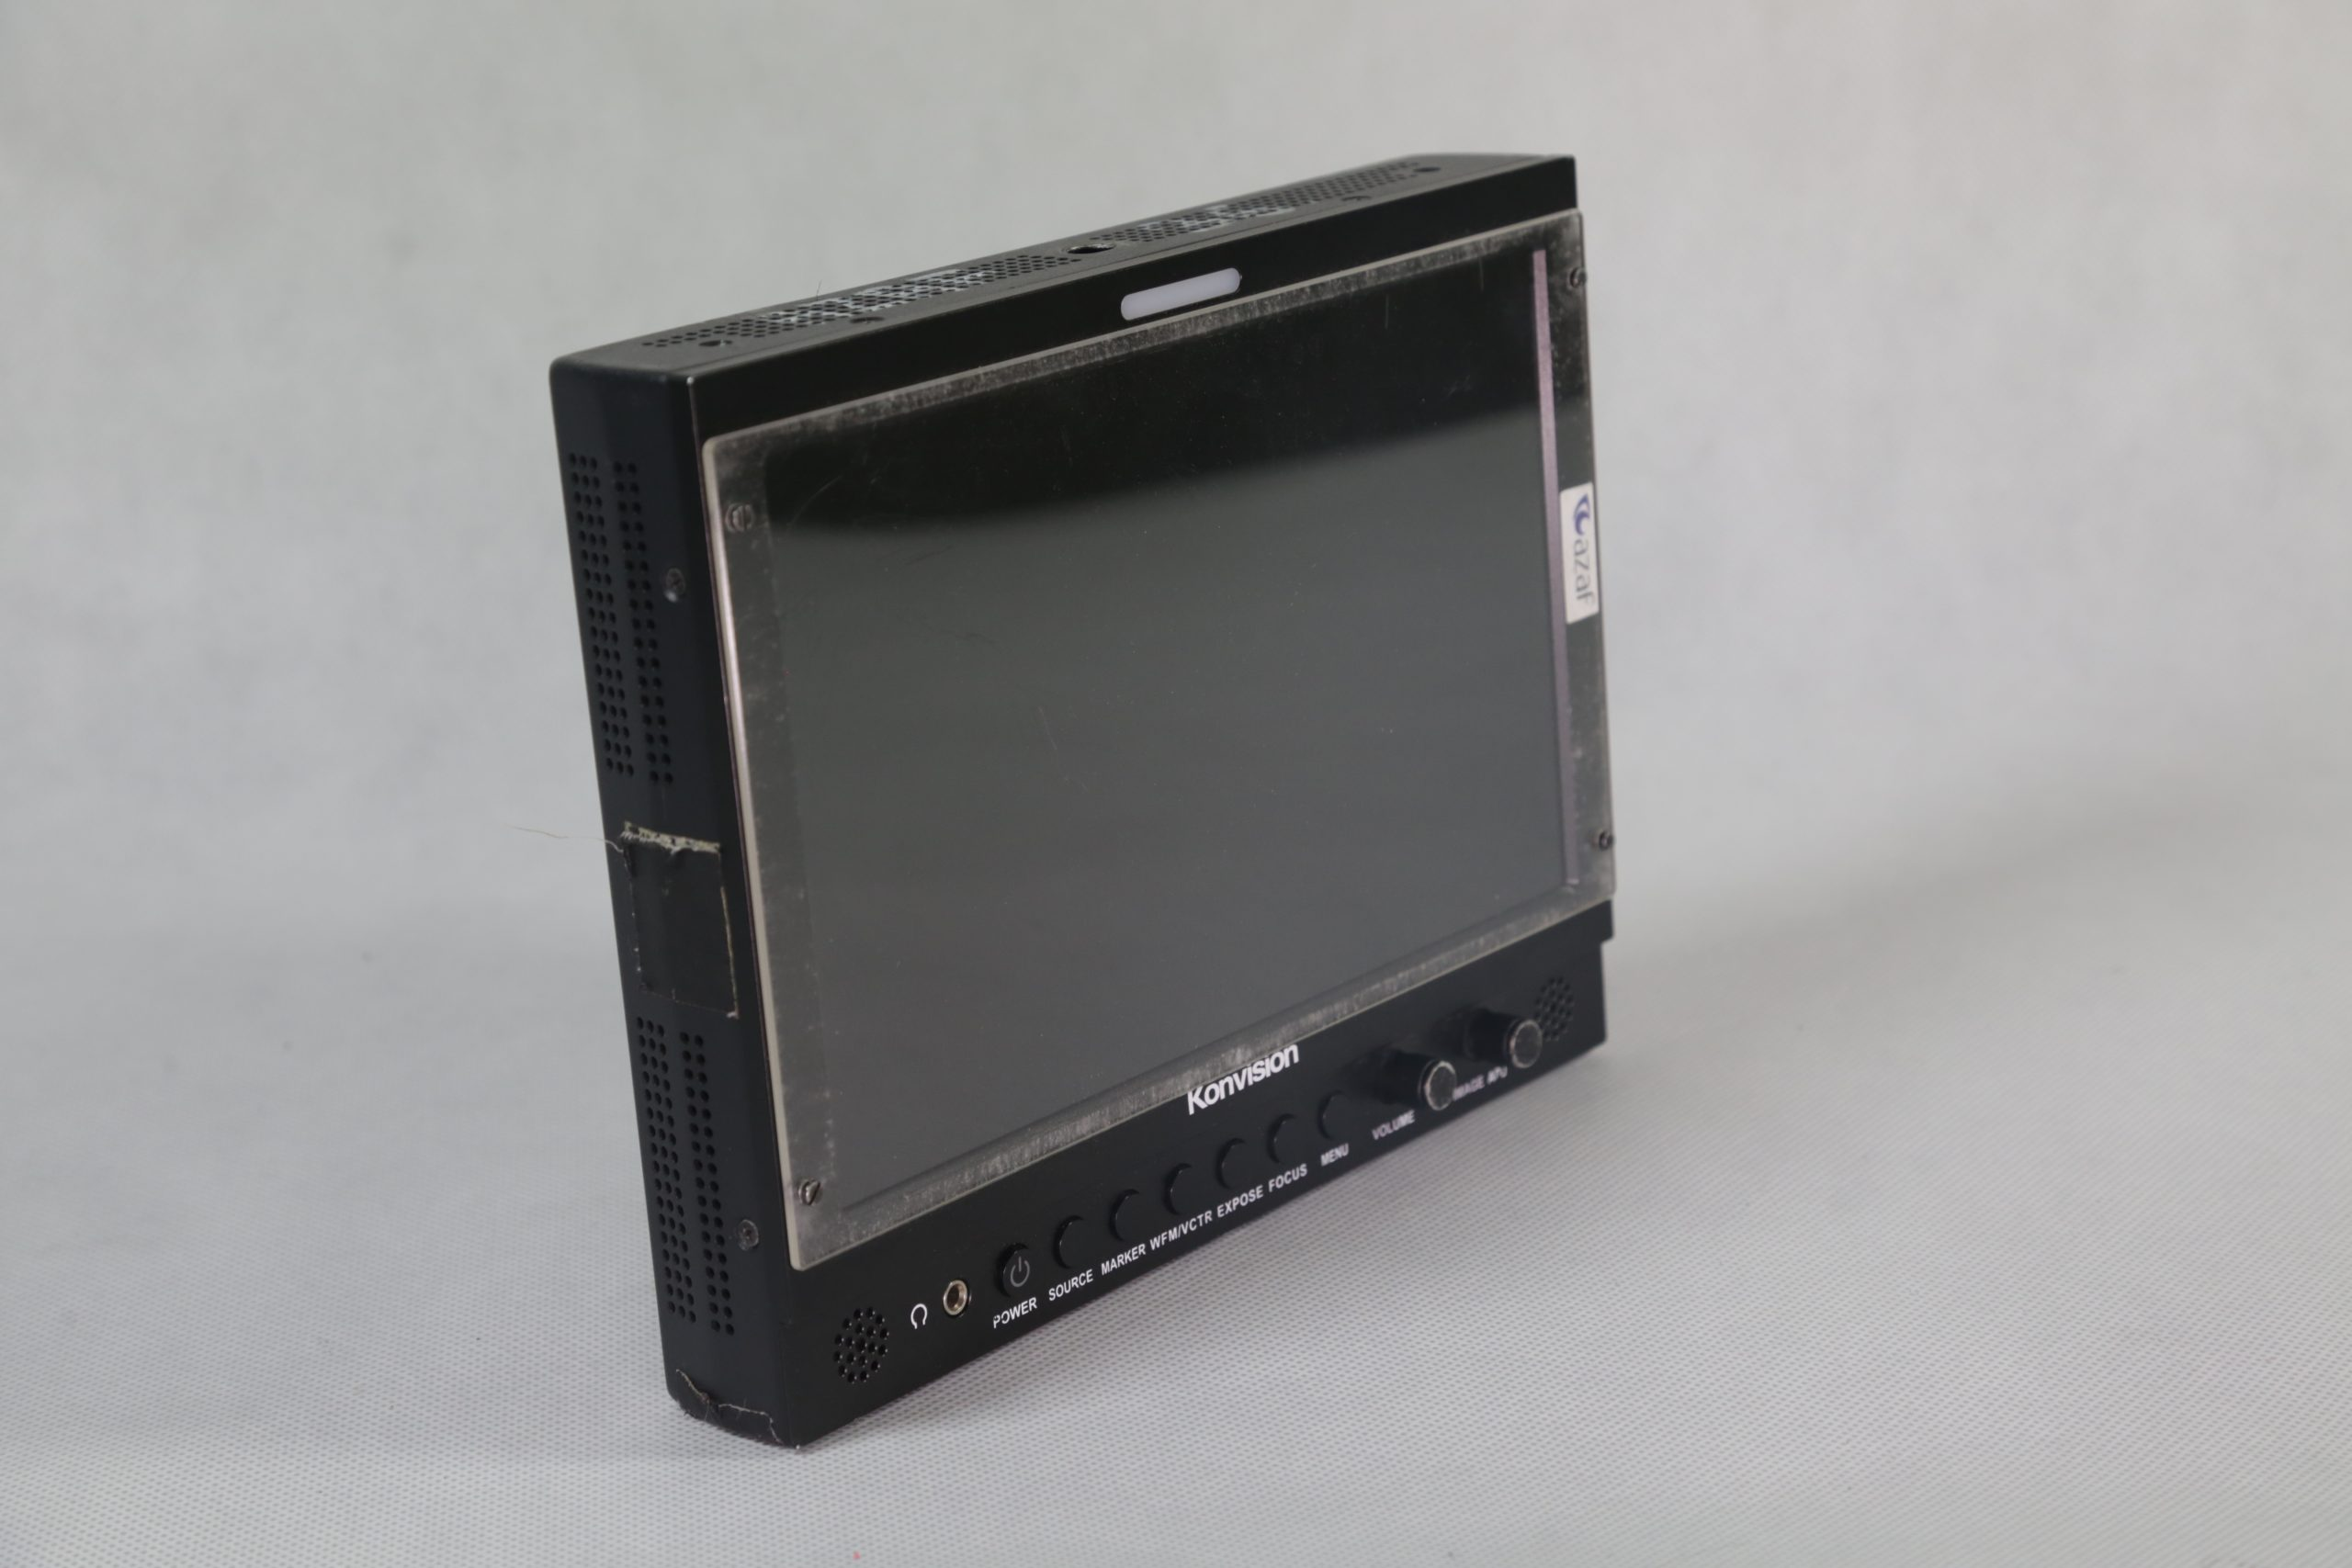 Konvision 9 cali KVM - 9051W